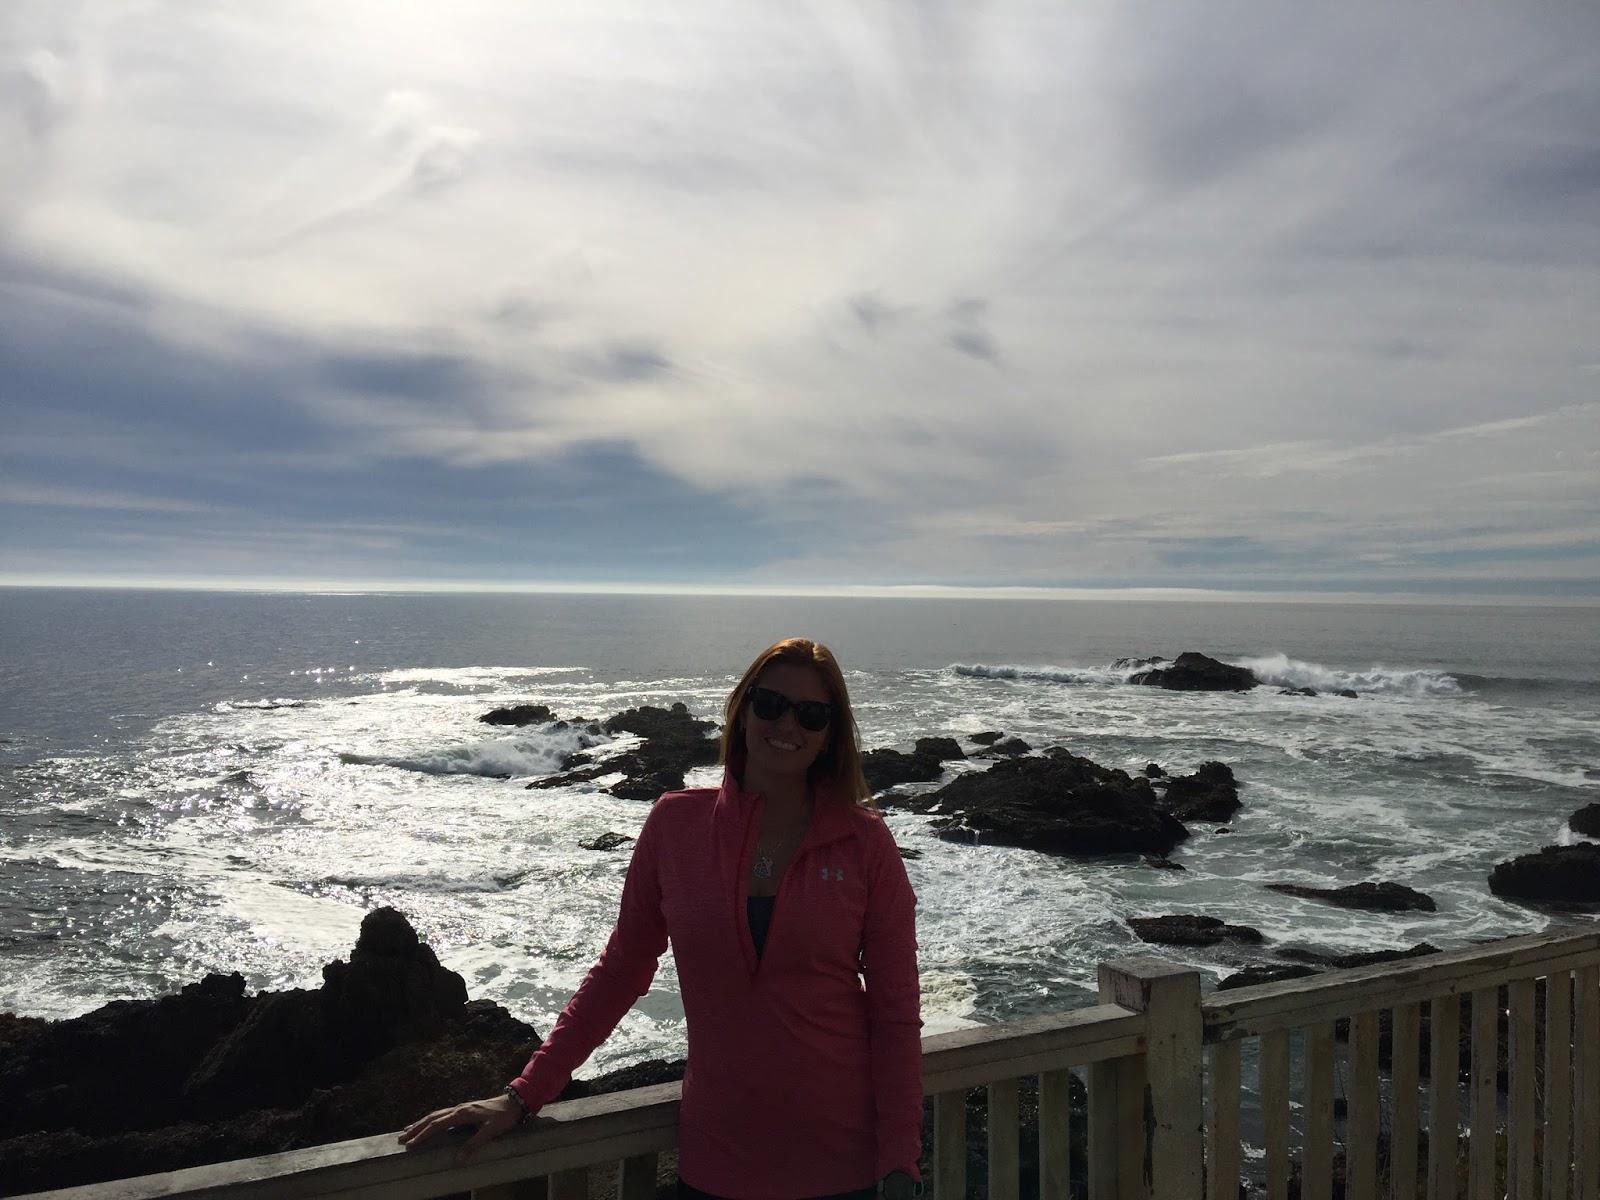 Point Lobos - Big Sur